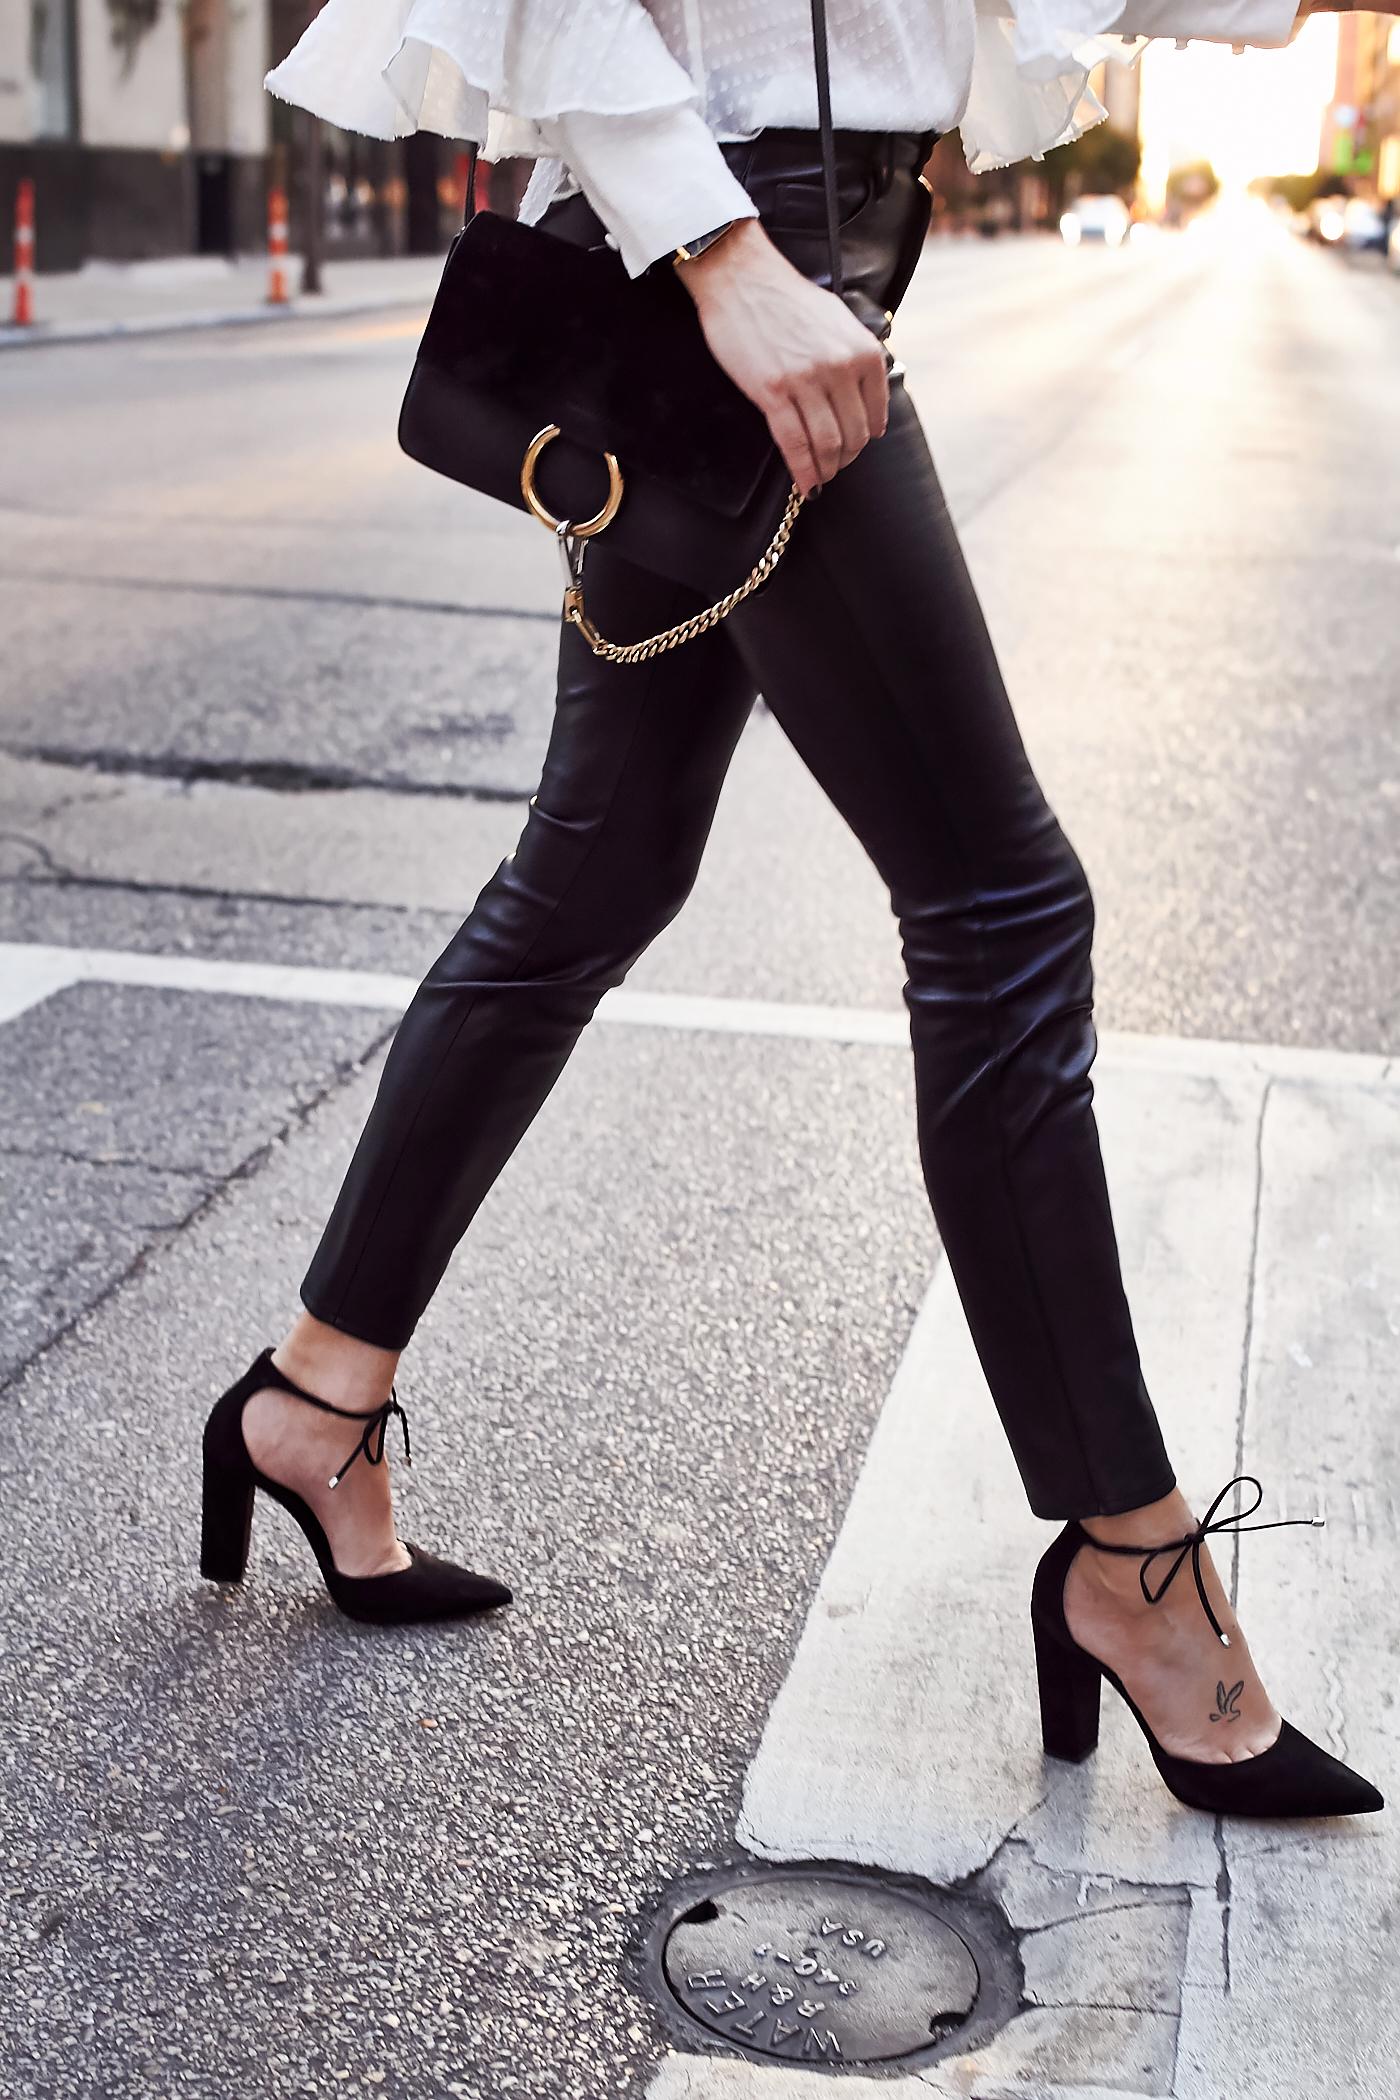 fashion-jackson-chloe-faye-handbag-black-faux-leather-skinny-pants-black-bow-pumps